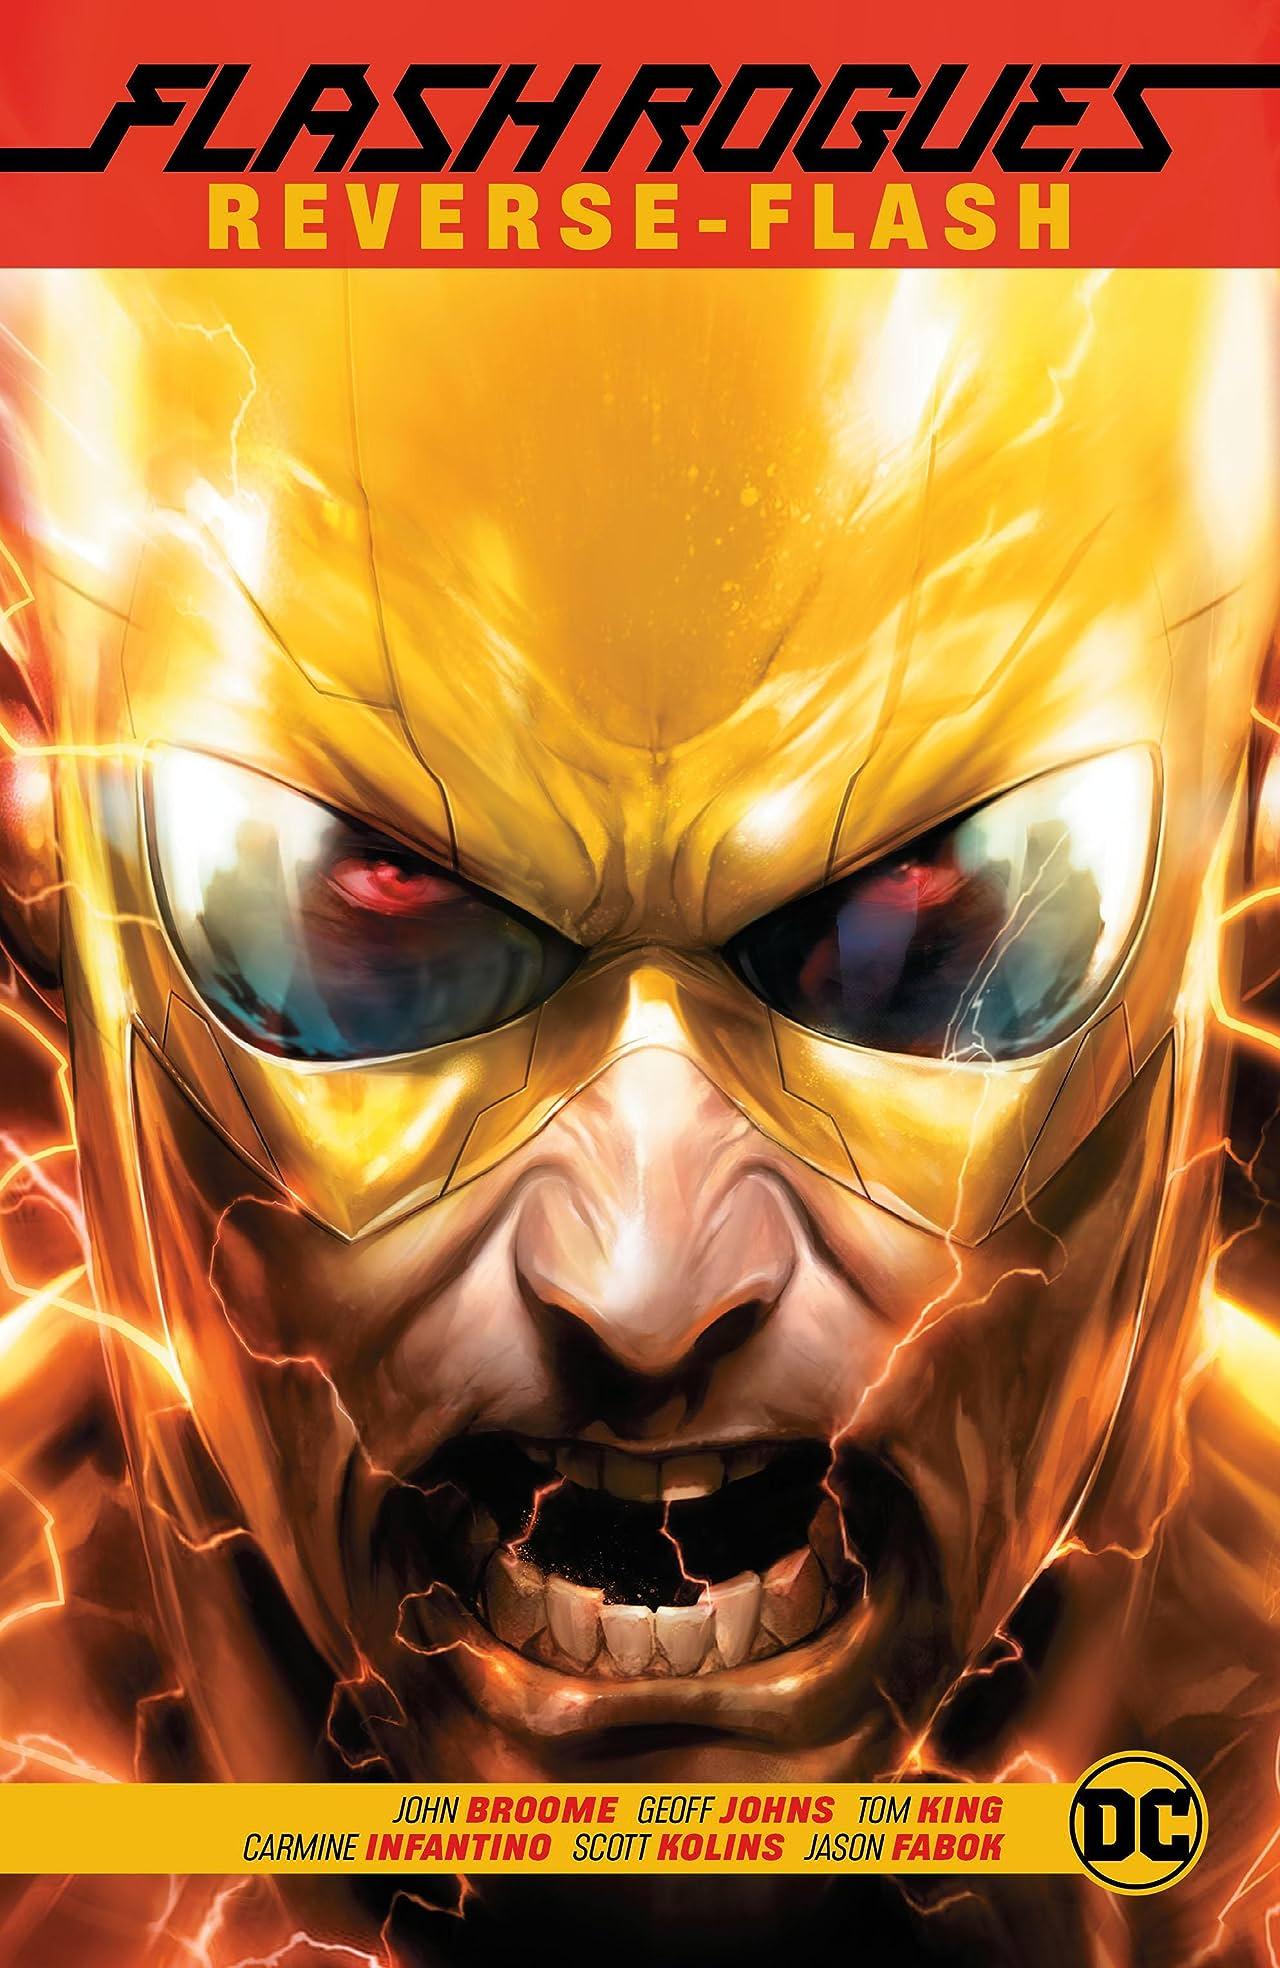 Flash Rogues: Reverse Flash